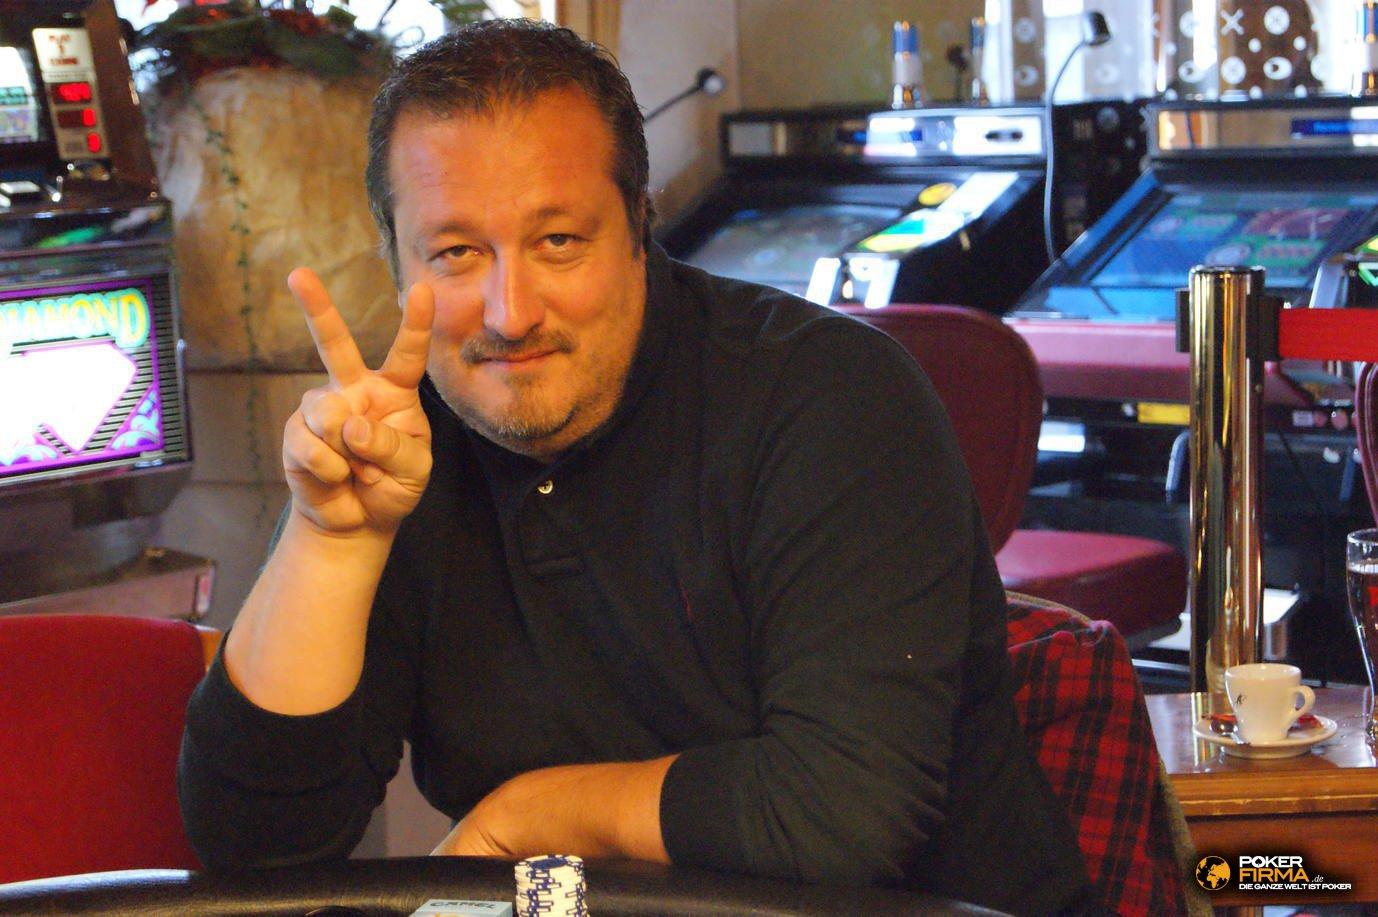 Mountain_Poker_Party_1500_NLH_081011_Stefano_Bertoldi